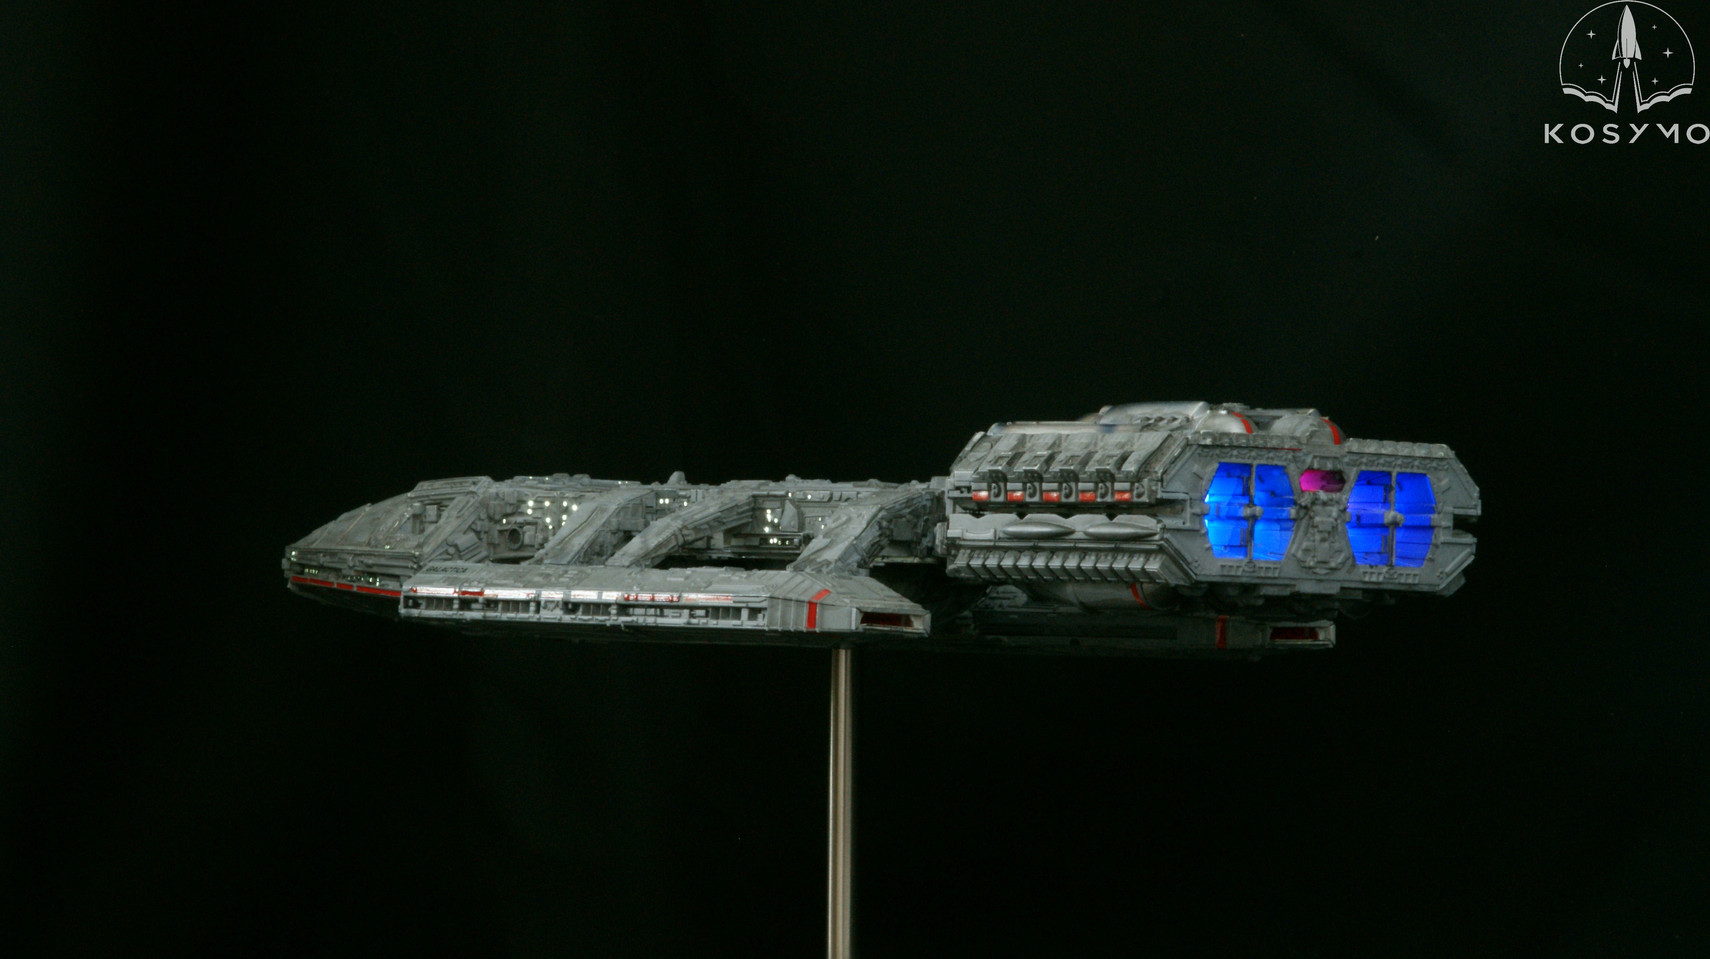 Galactica_024.JPG